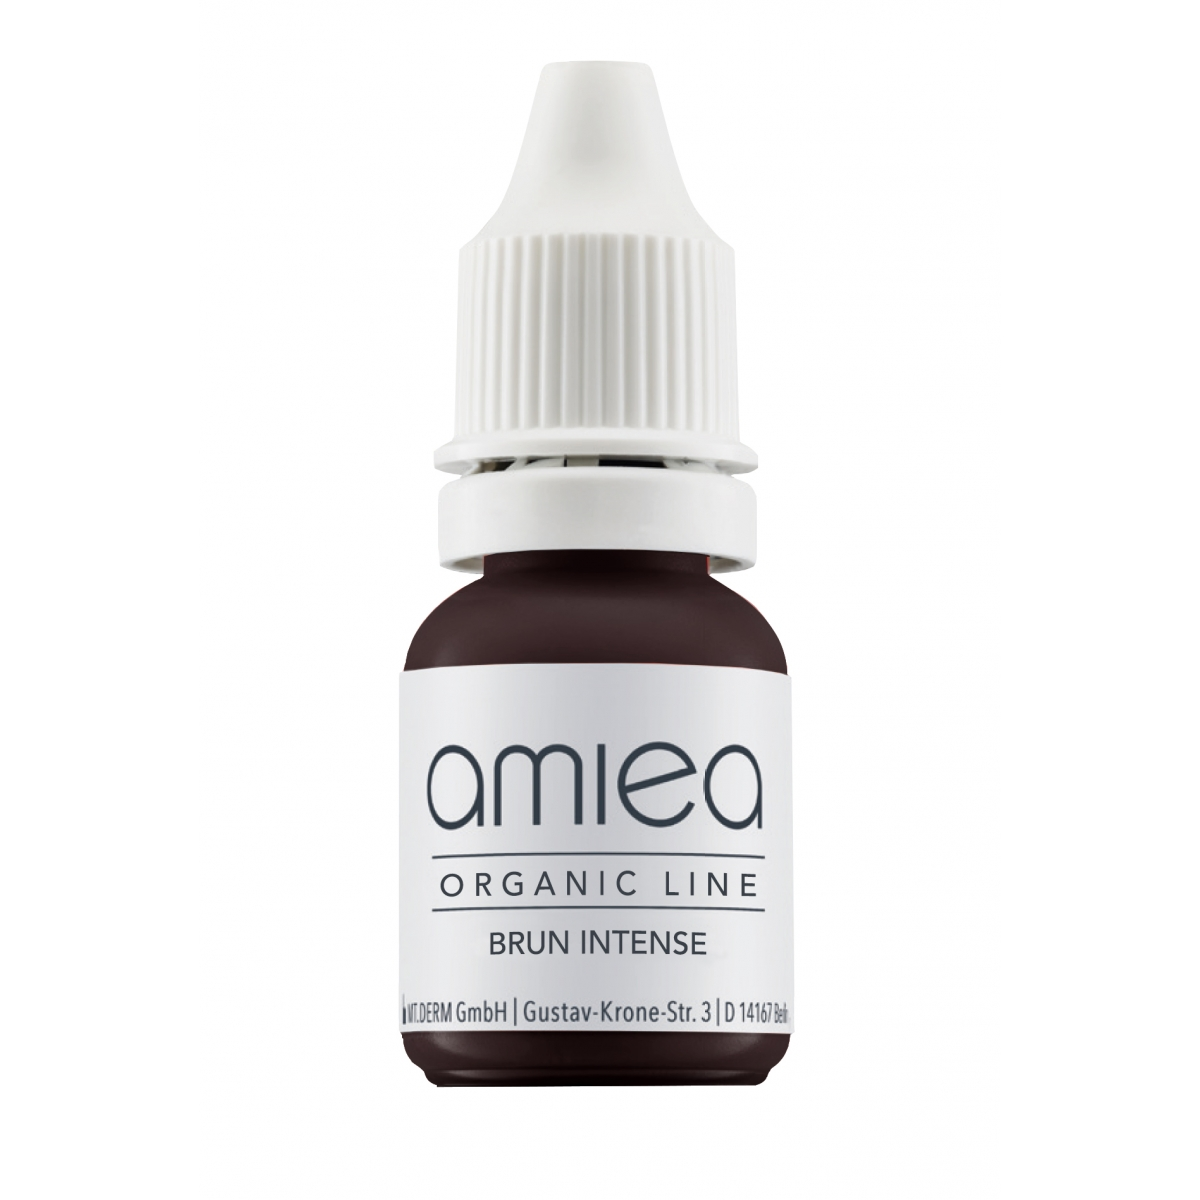 ORGANIC LINE (5ml)  - PIGMENT BRUN INTENSE ORGANICLINE AMIEA (5 ml)